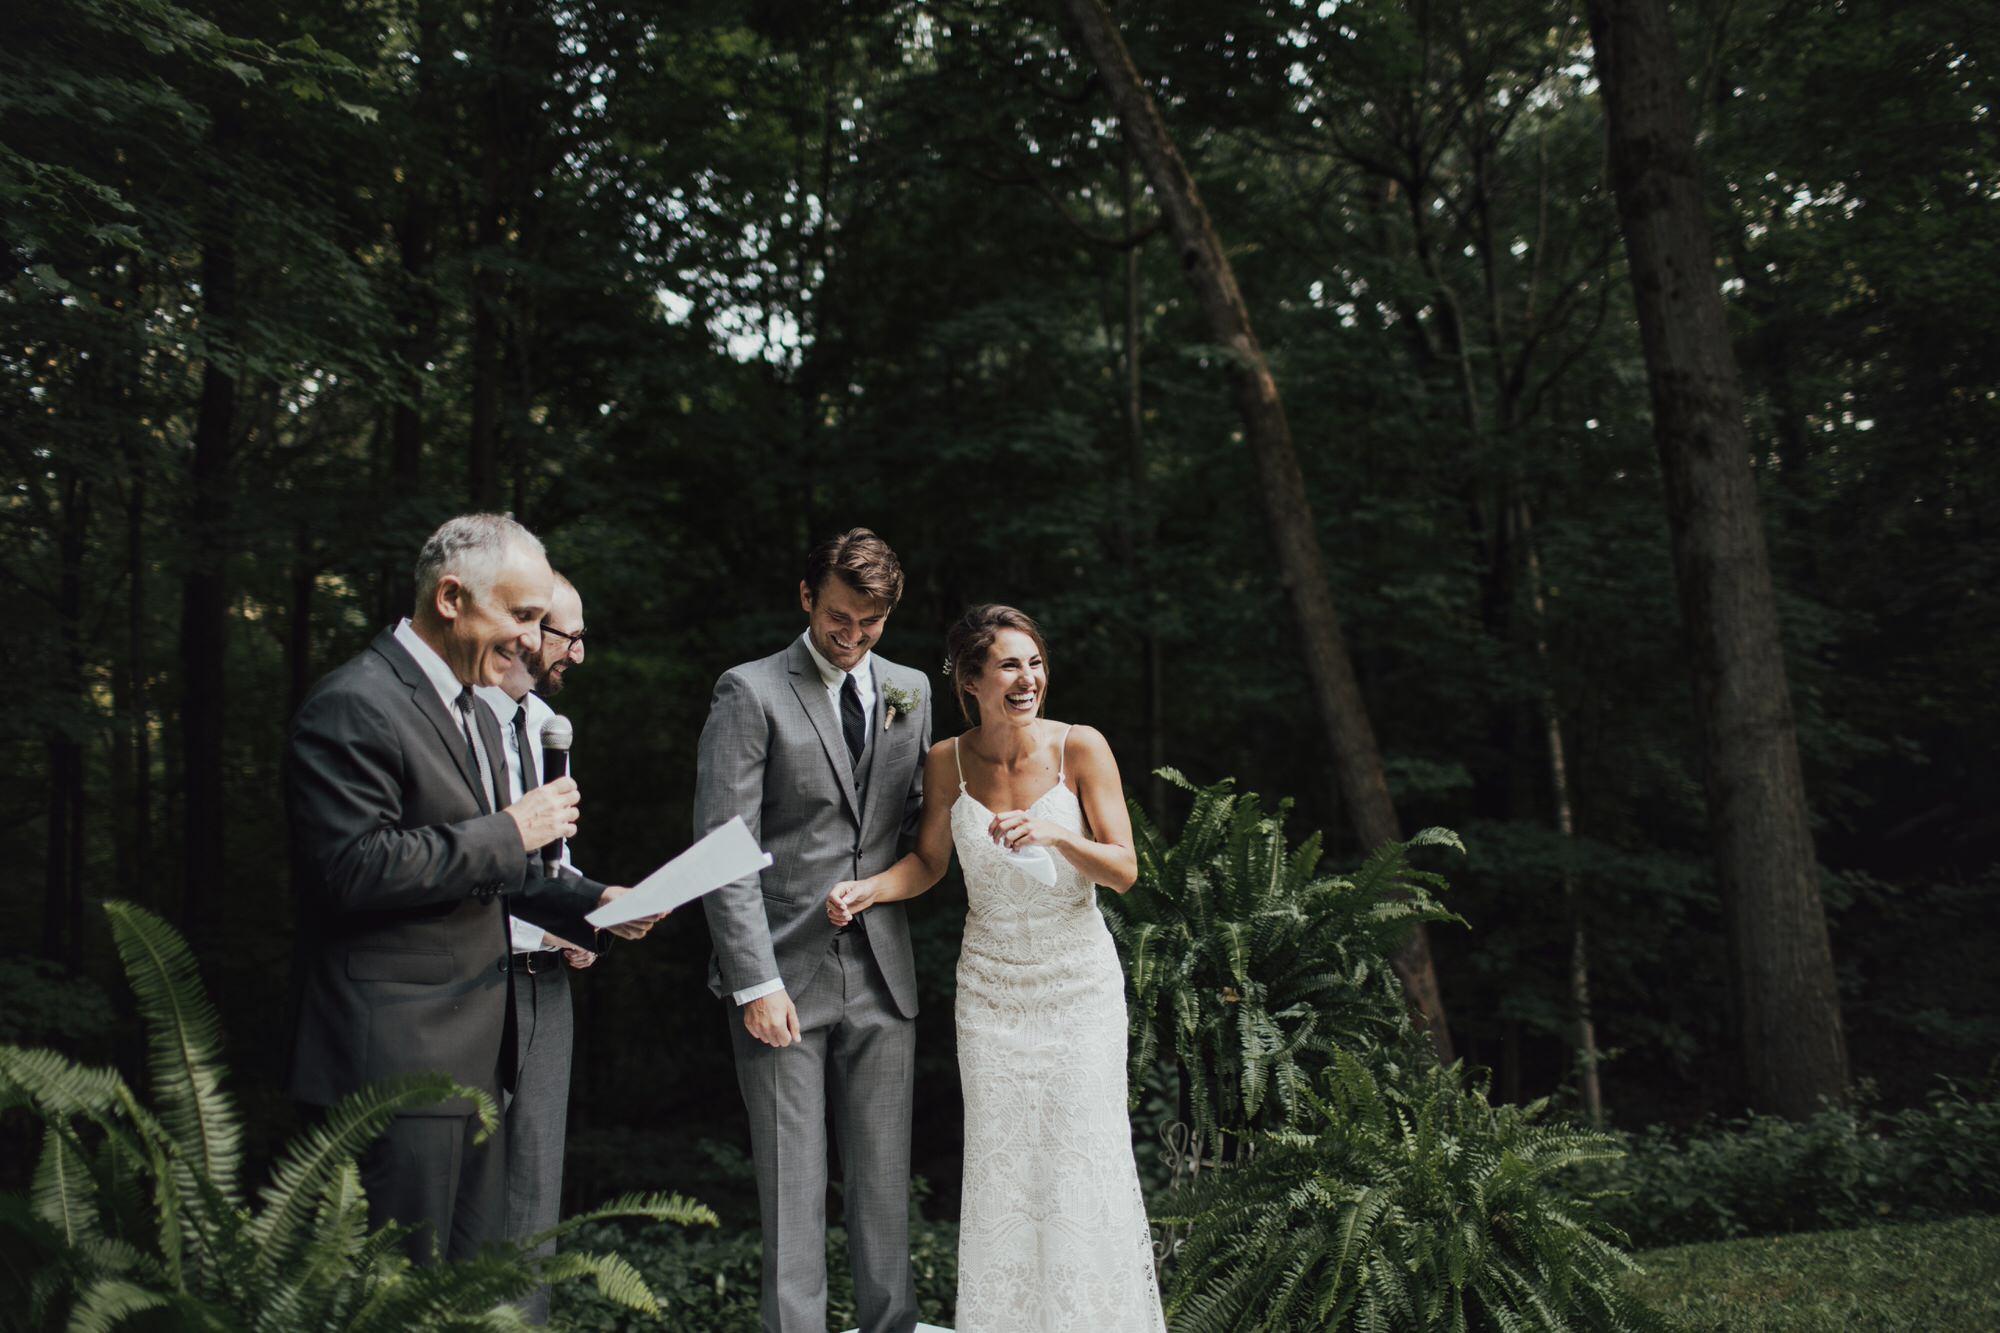 emily-aaron-rochester-new-york-wedding-photographer-72.JPG